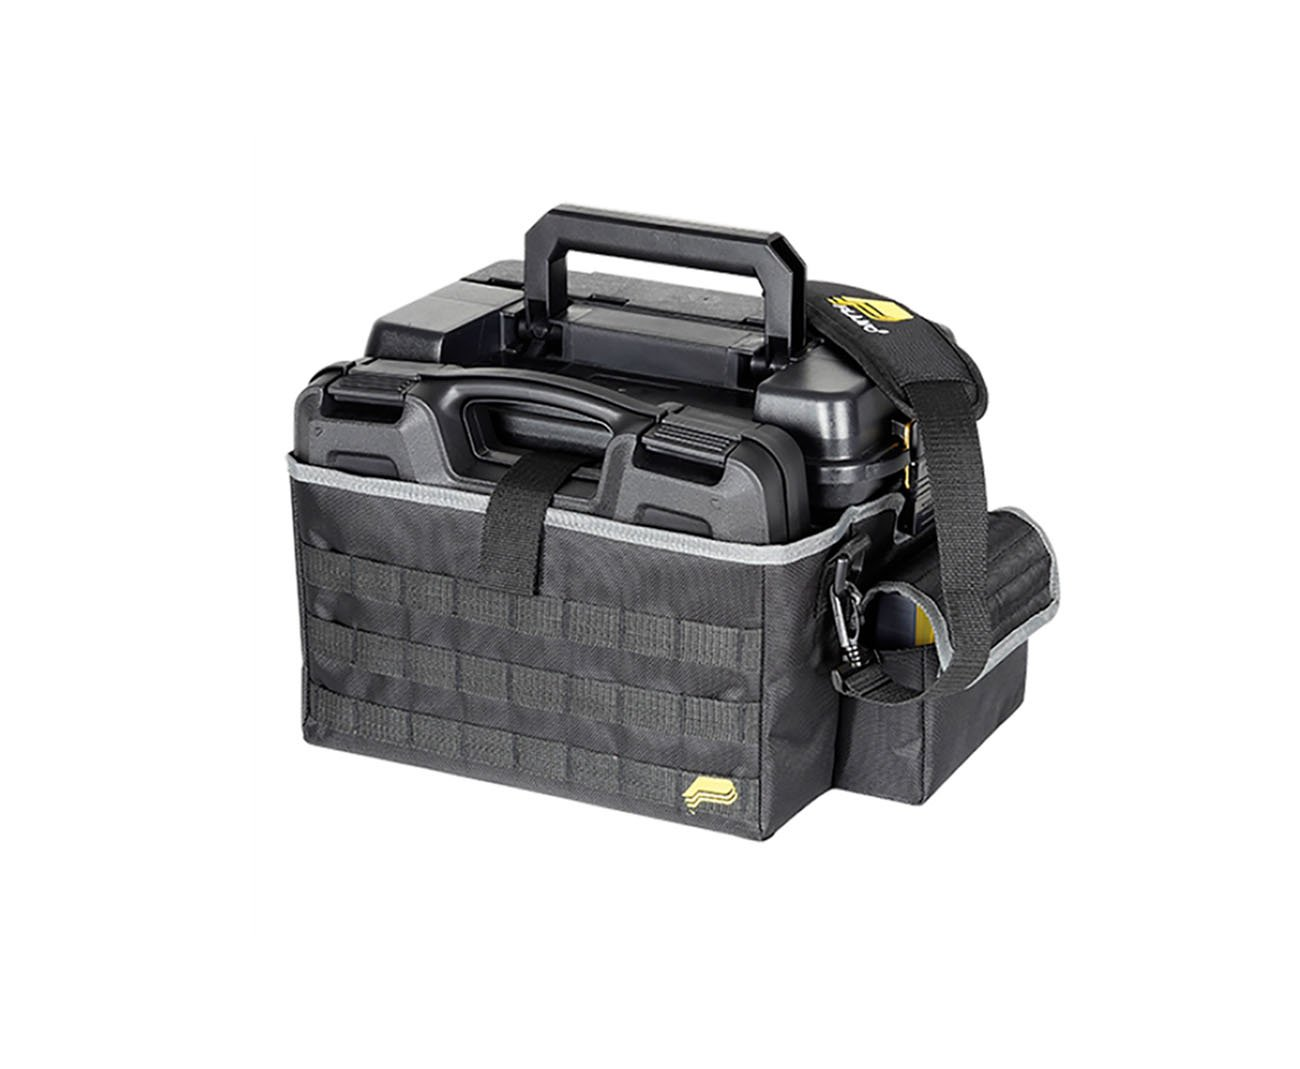 Case Para 2 Pistolas E Acessorios - Plano